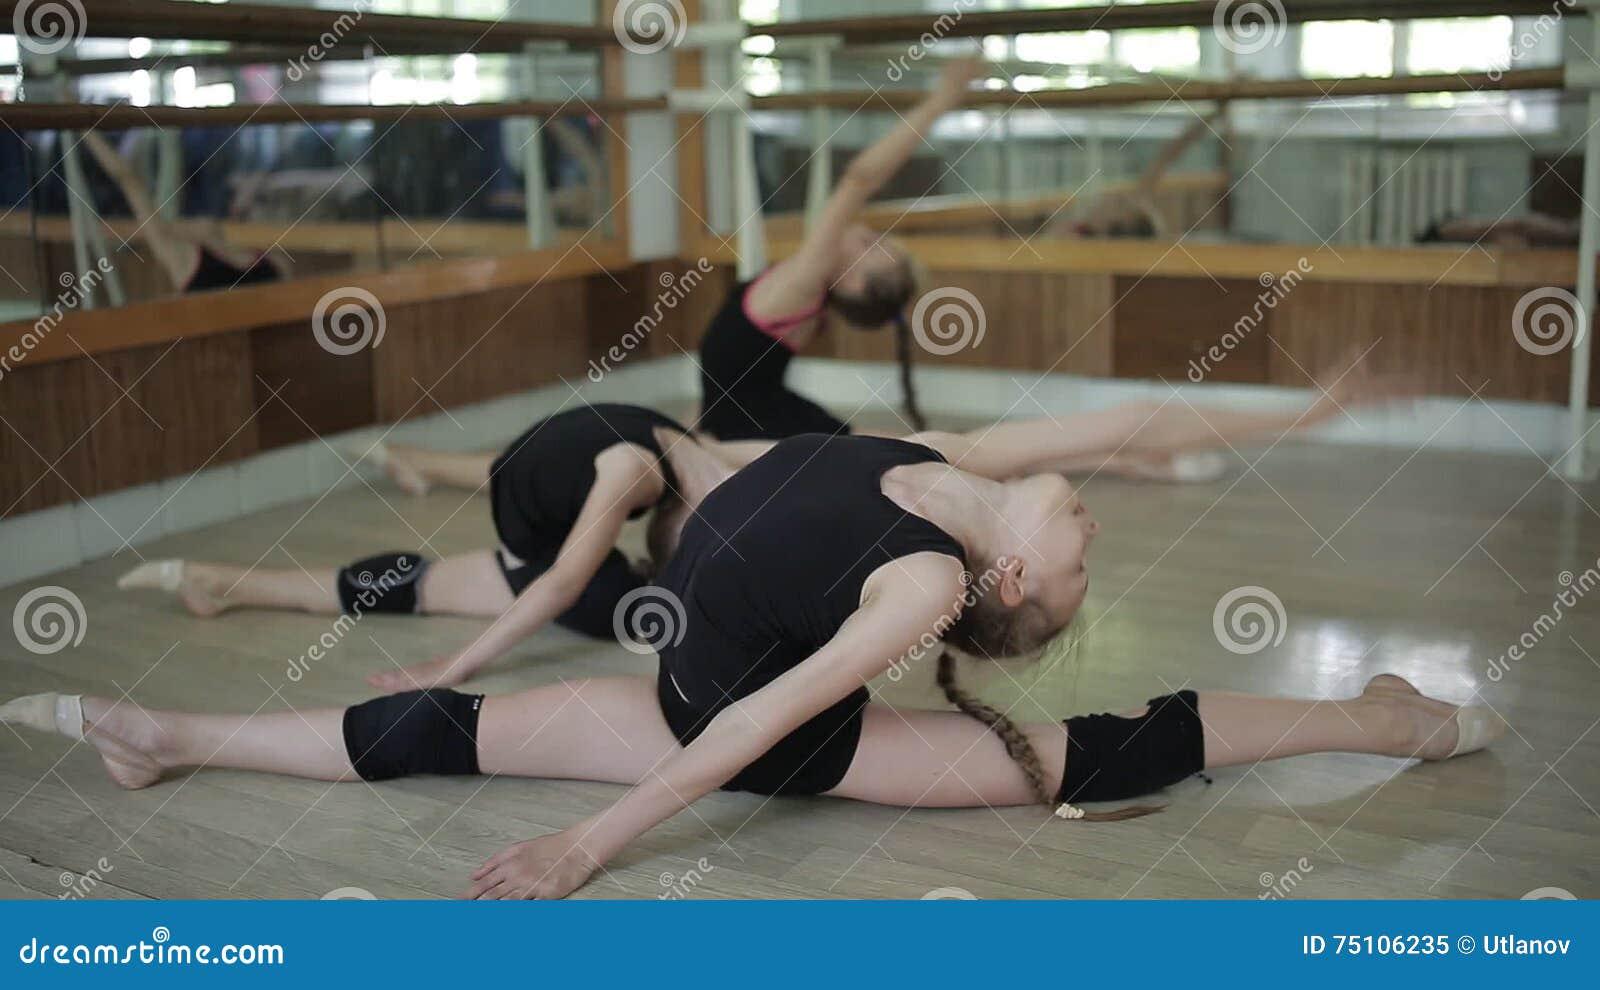 Rhythmic Gymnastics Competition - Blurred Stock Photo